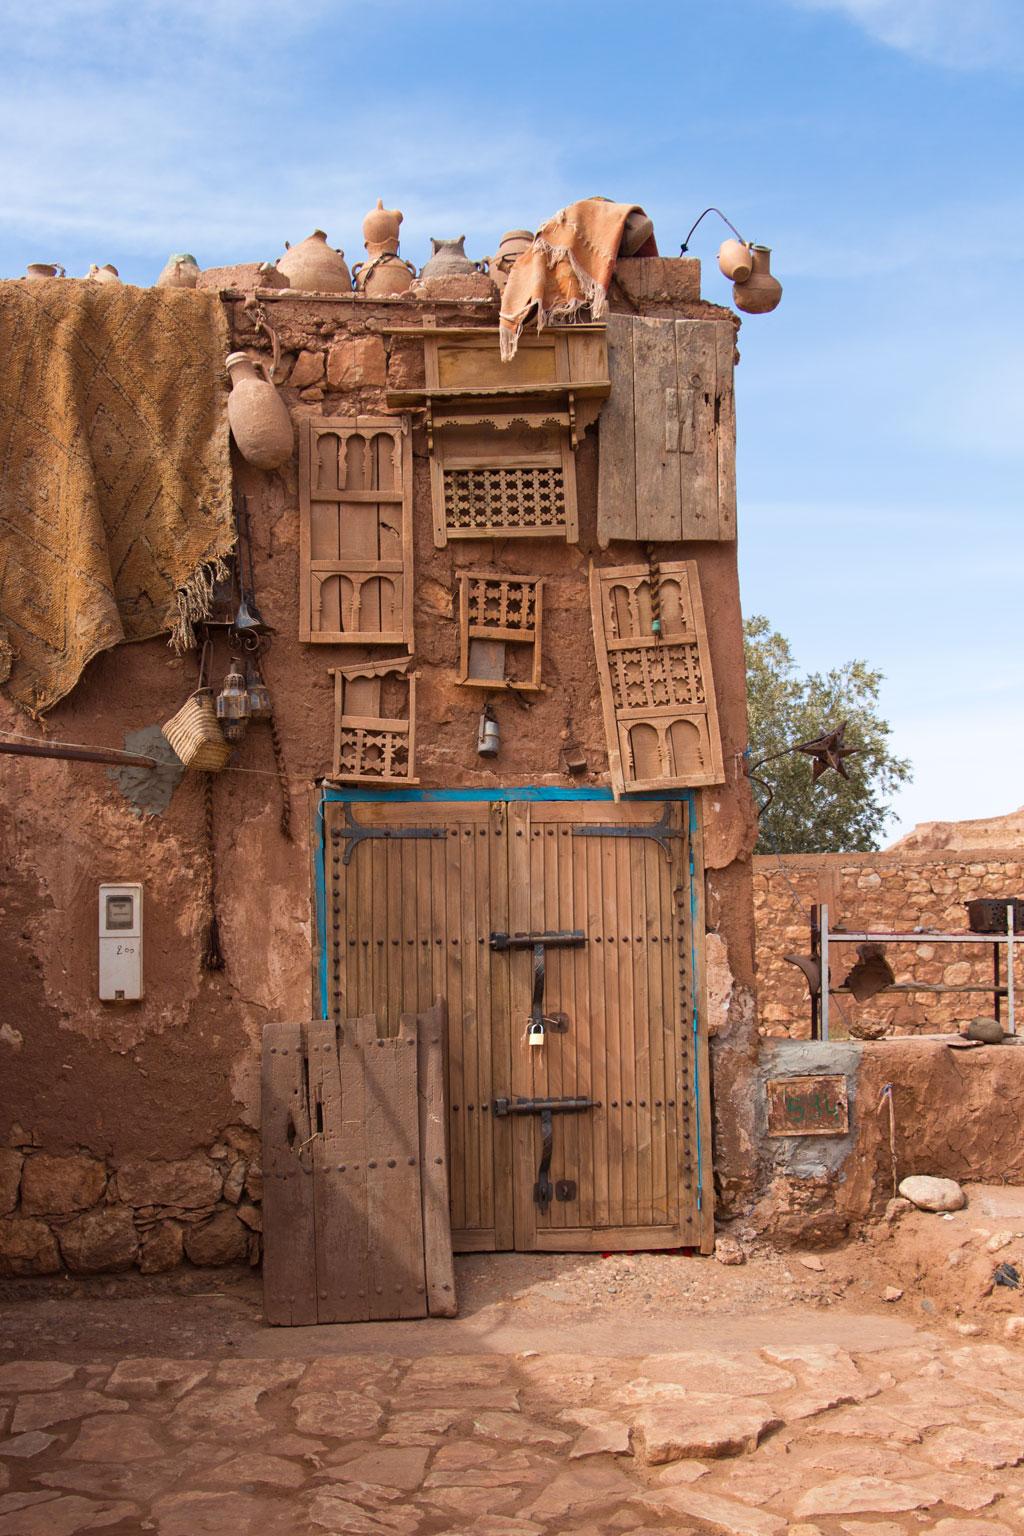 Marokko Trip –Ait Ben Haddou |SOMEWHERE ELSE